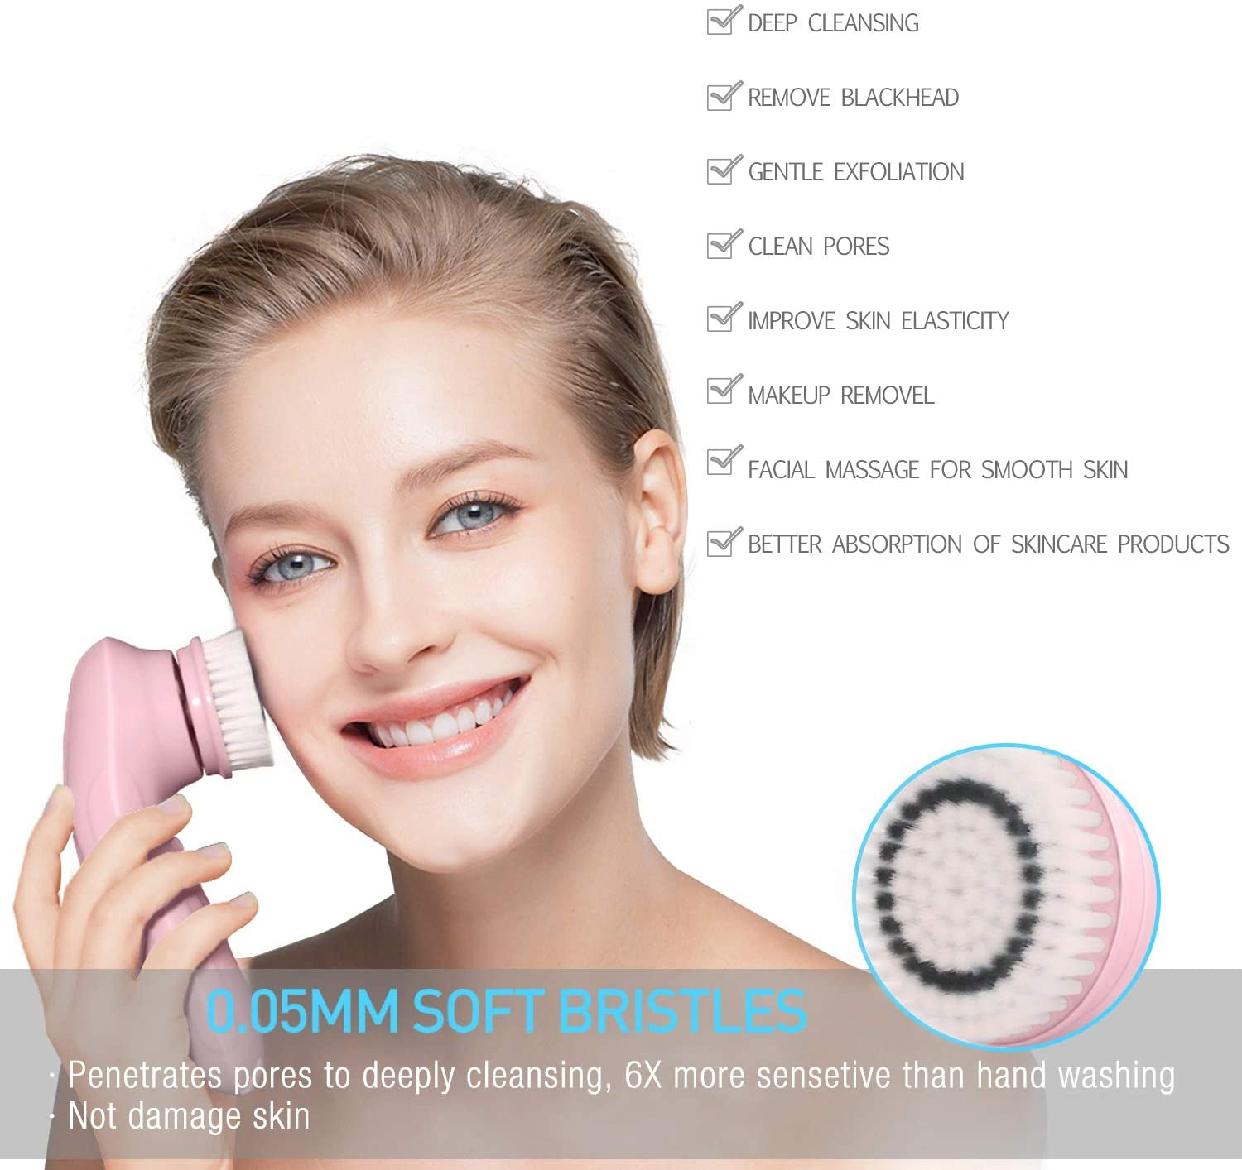 7FHLP(ナナエフエイチエルピー) 洗顔ブラシ充電式の商品画像3